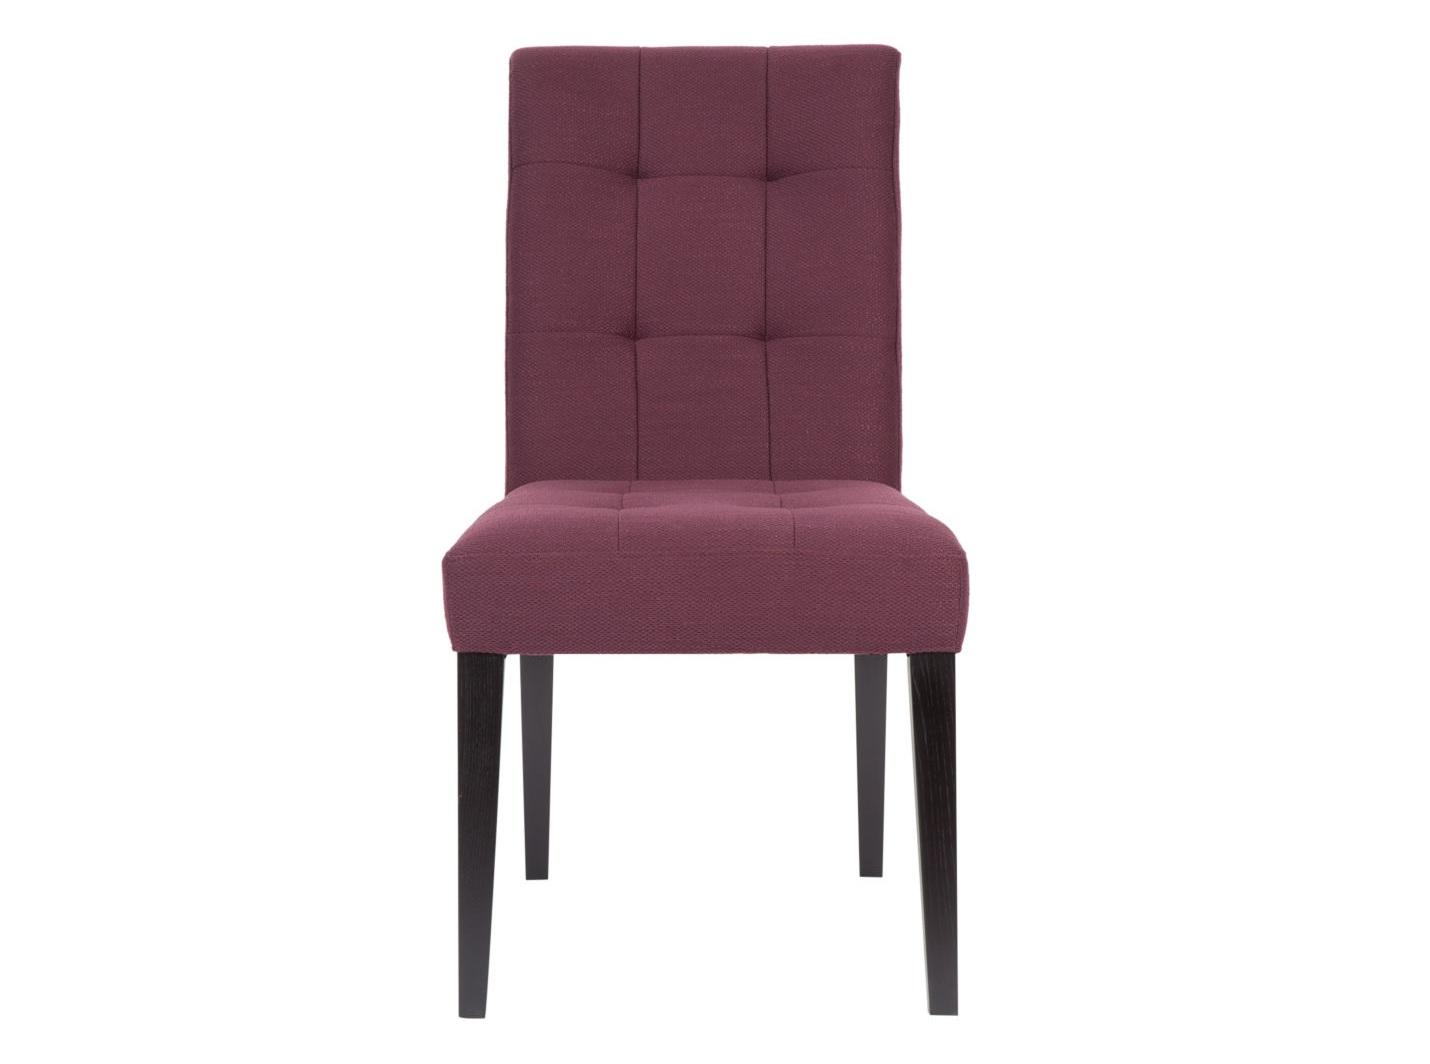 Стул RinoОбеденные стулья<br><br><br>Material: Текстиль<br>Ширина см: 50<br>Высота см: 97<br>Глубина см: 68